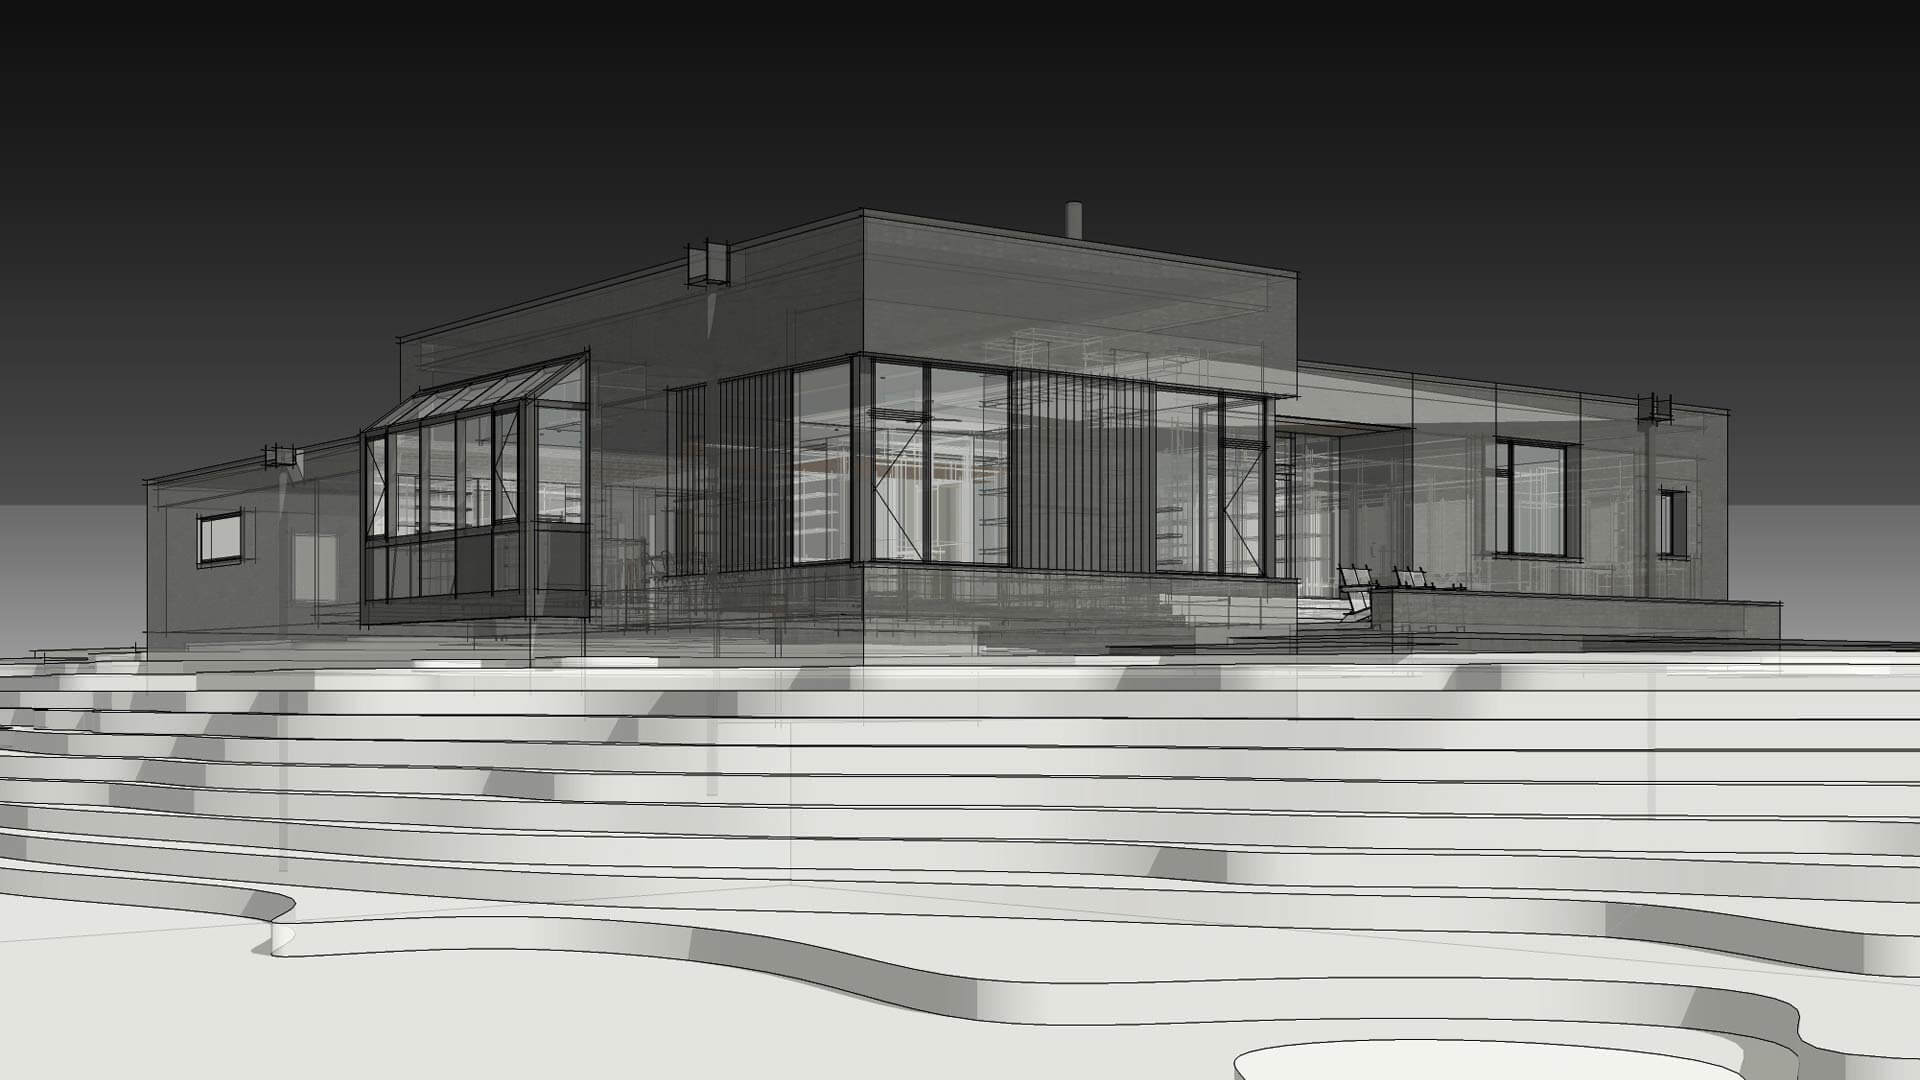 Northwest Exterior Elevation (Rendering) - Modern Brick House, Indianapolis, Windcombe Neighborhood